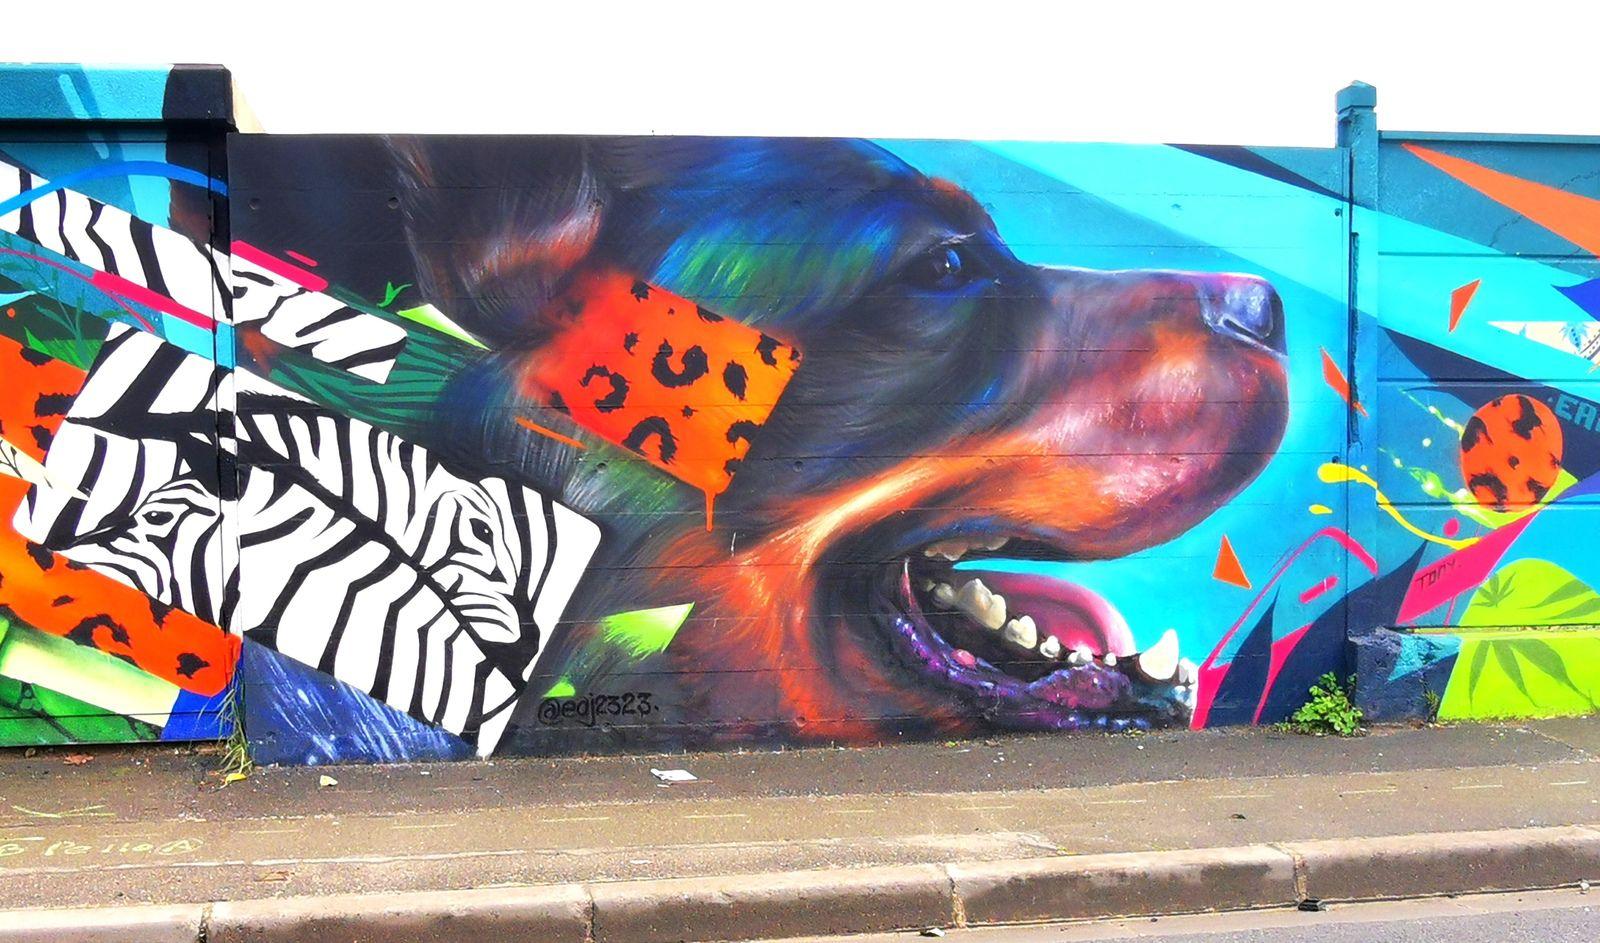 Street art à Bagneux (92)